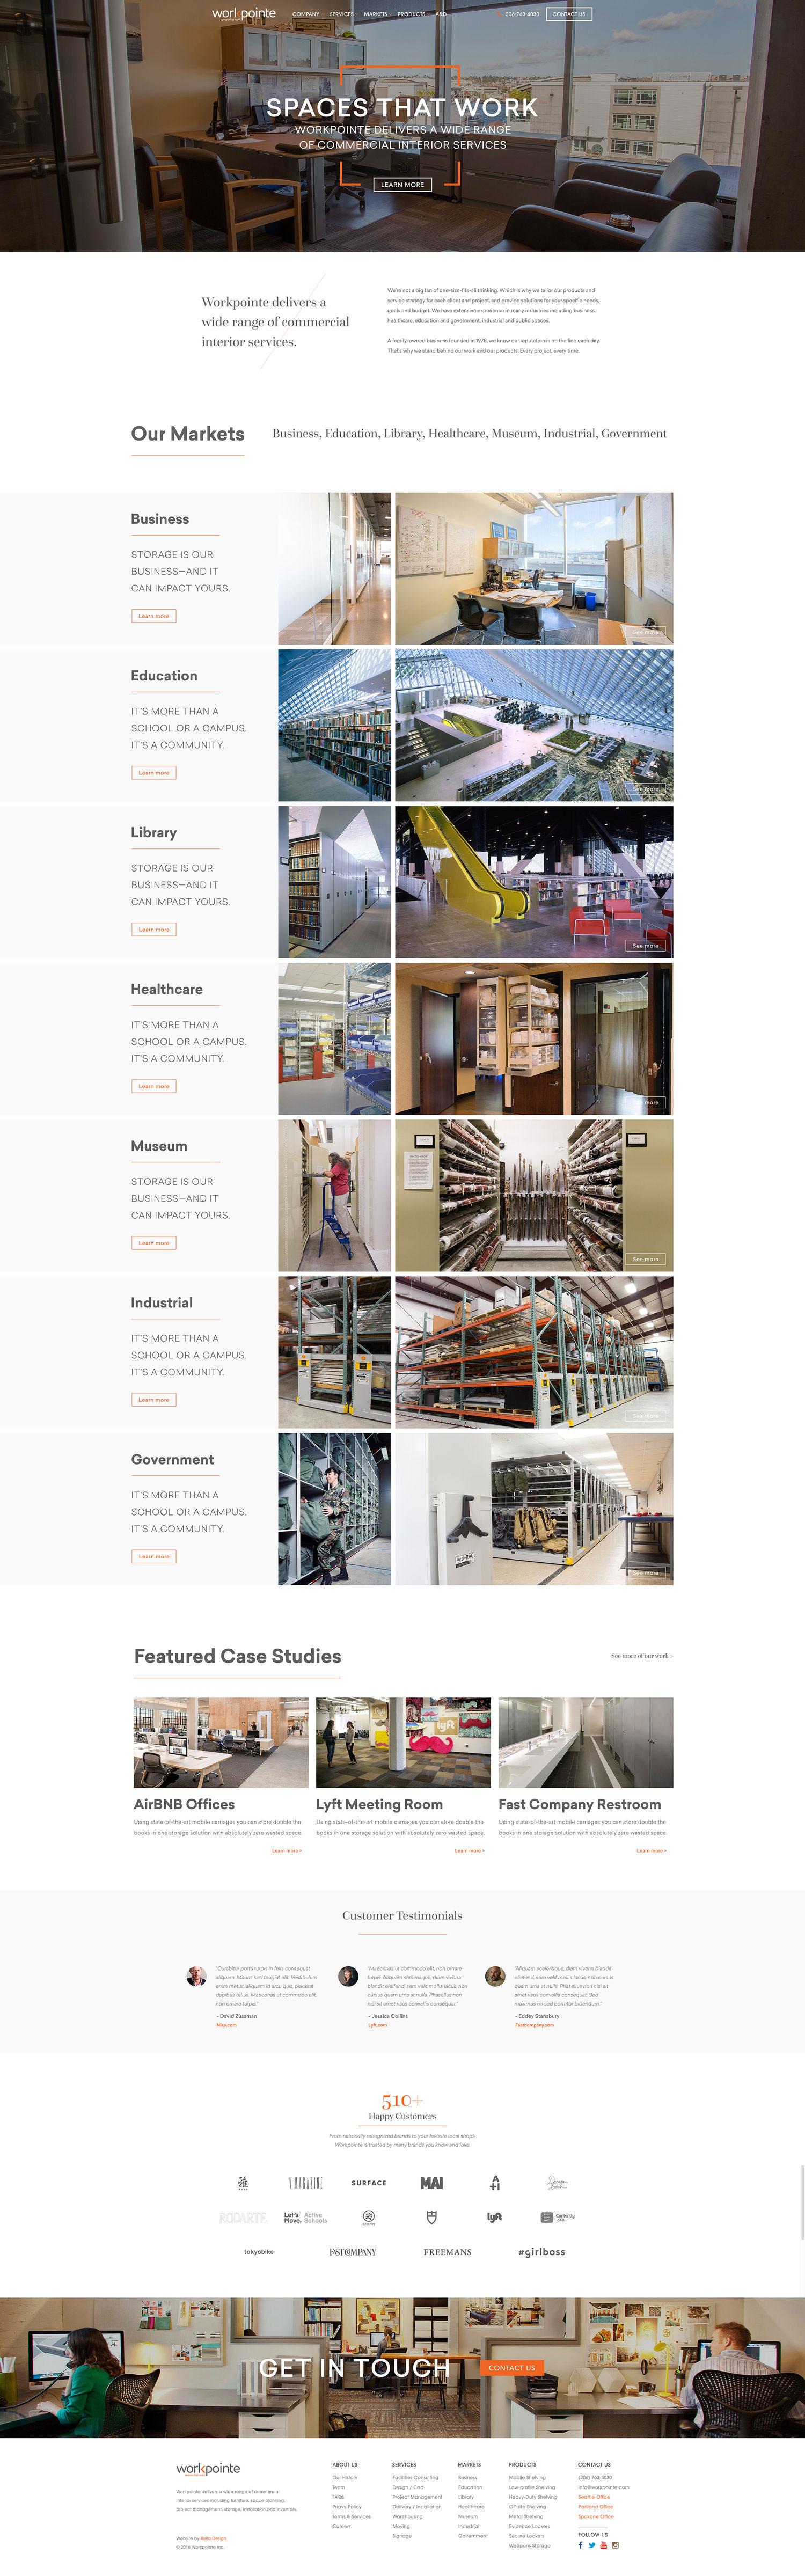 Web Design | Workpointe - Homepage (Desktop View)